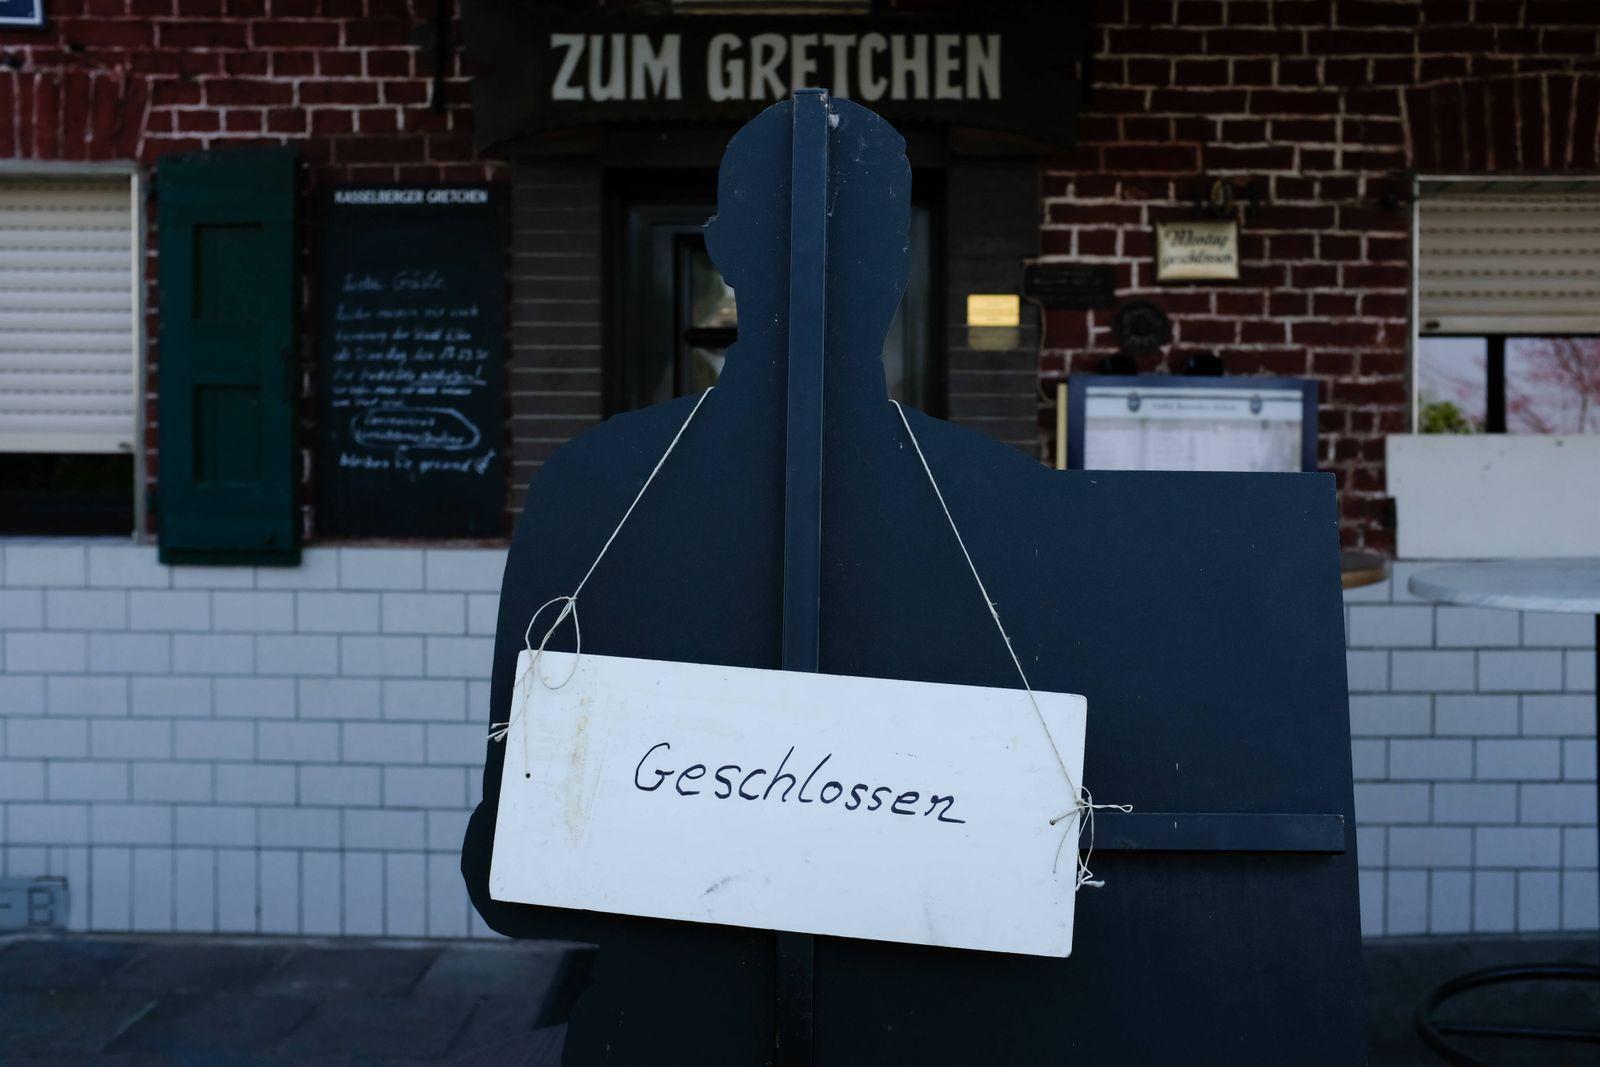 Koeln Geschlossene Gaststaette, Koeln, 28.03.2020 Geschlossene Gaststaette, Koeln, 28.03.2020, *** Cologne Closed resta